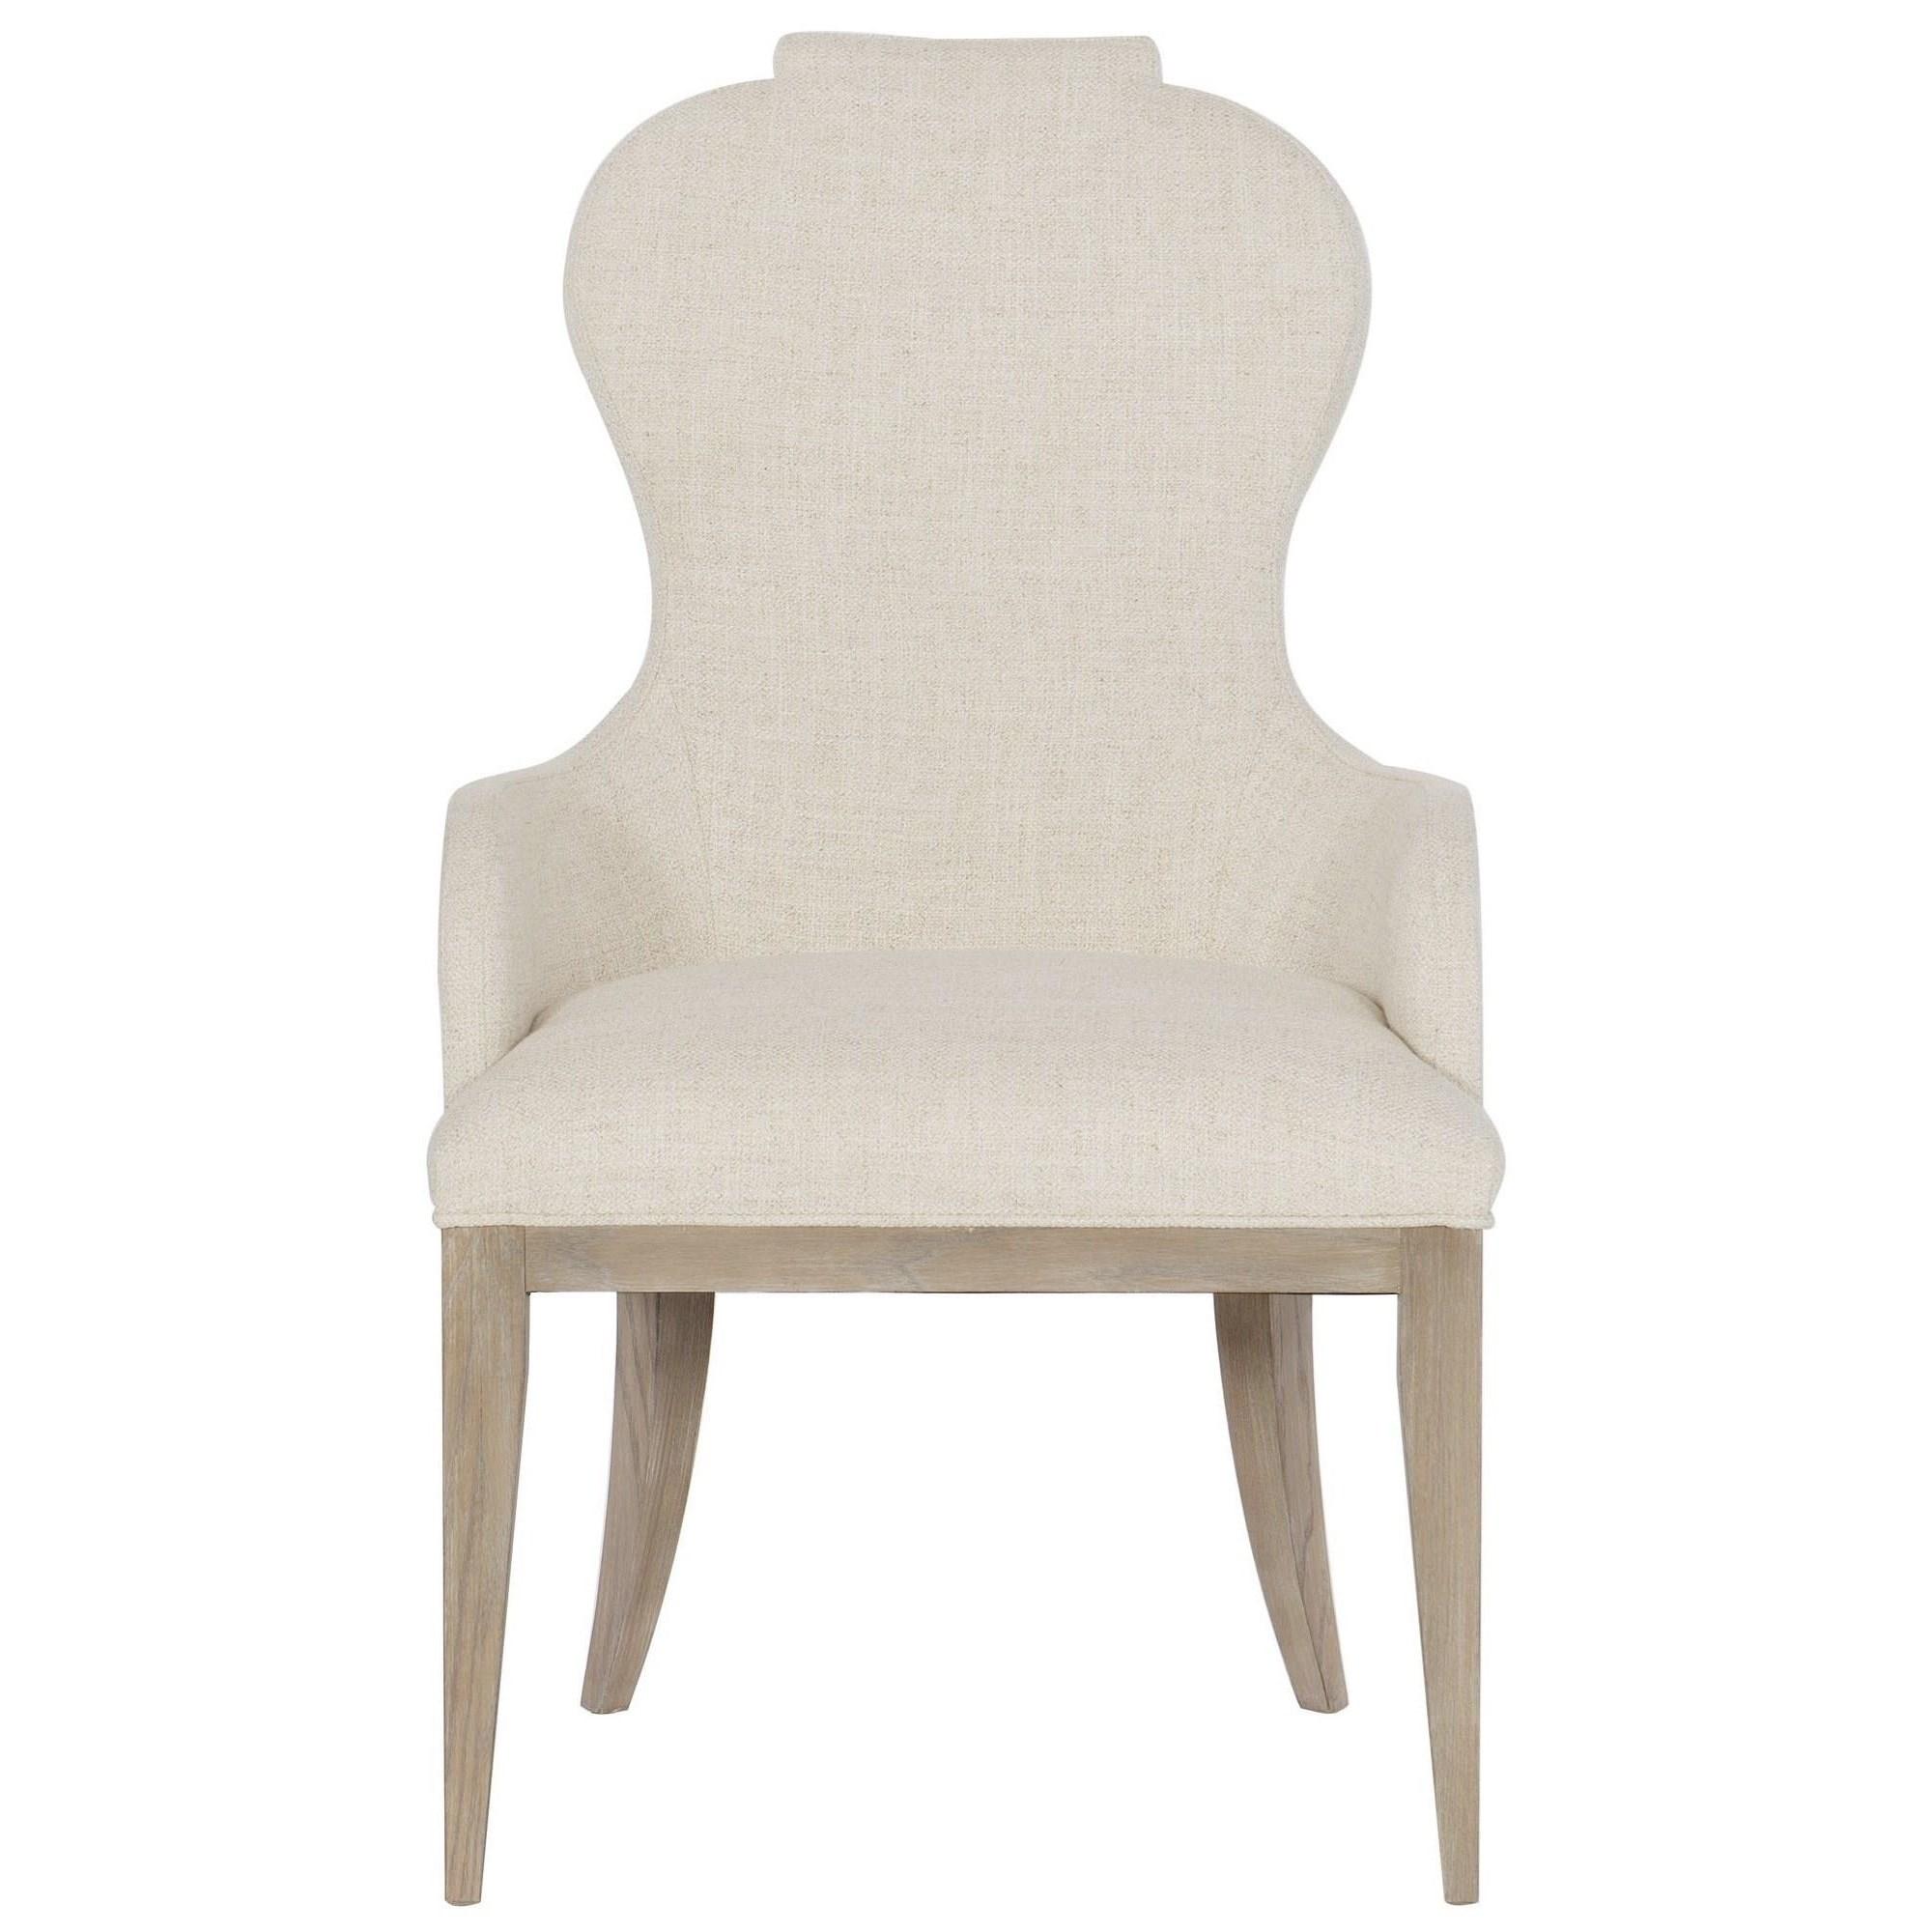 Santa Barbara Upholstered Arm Chair by Bernhardt at Baer's Furniture